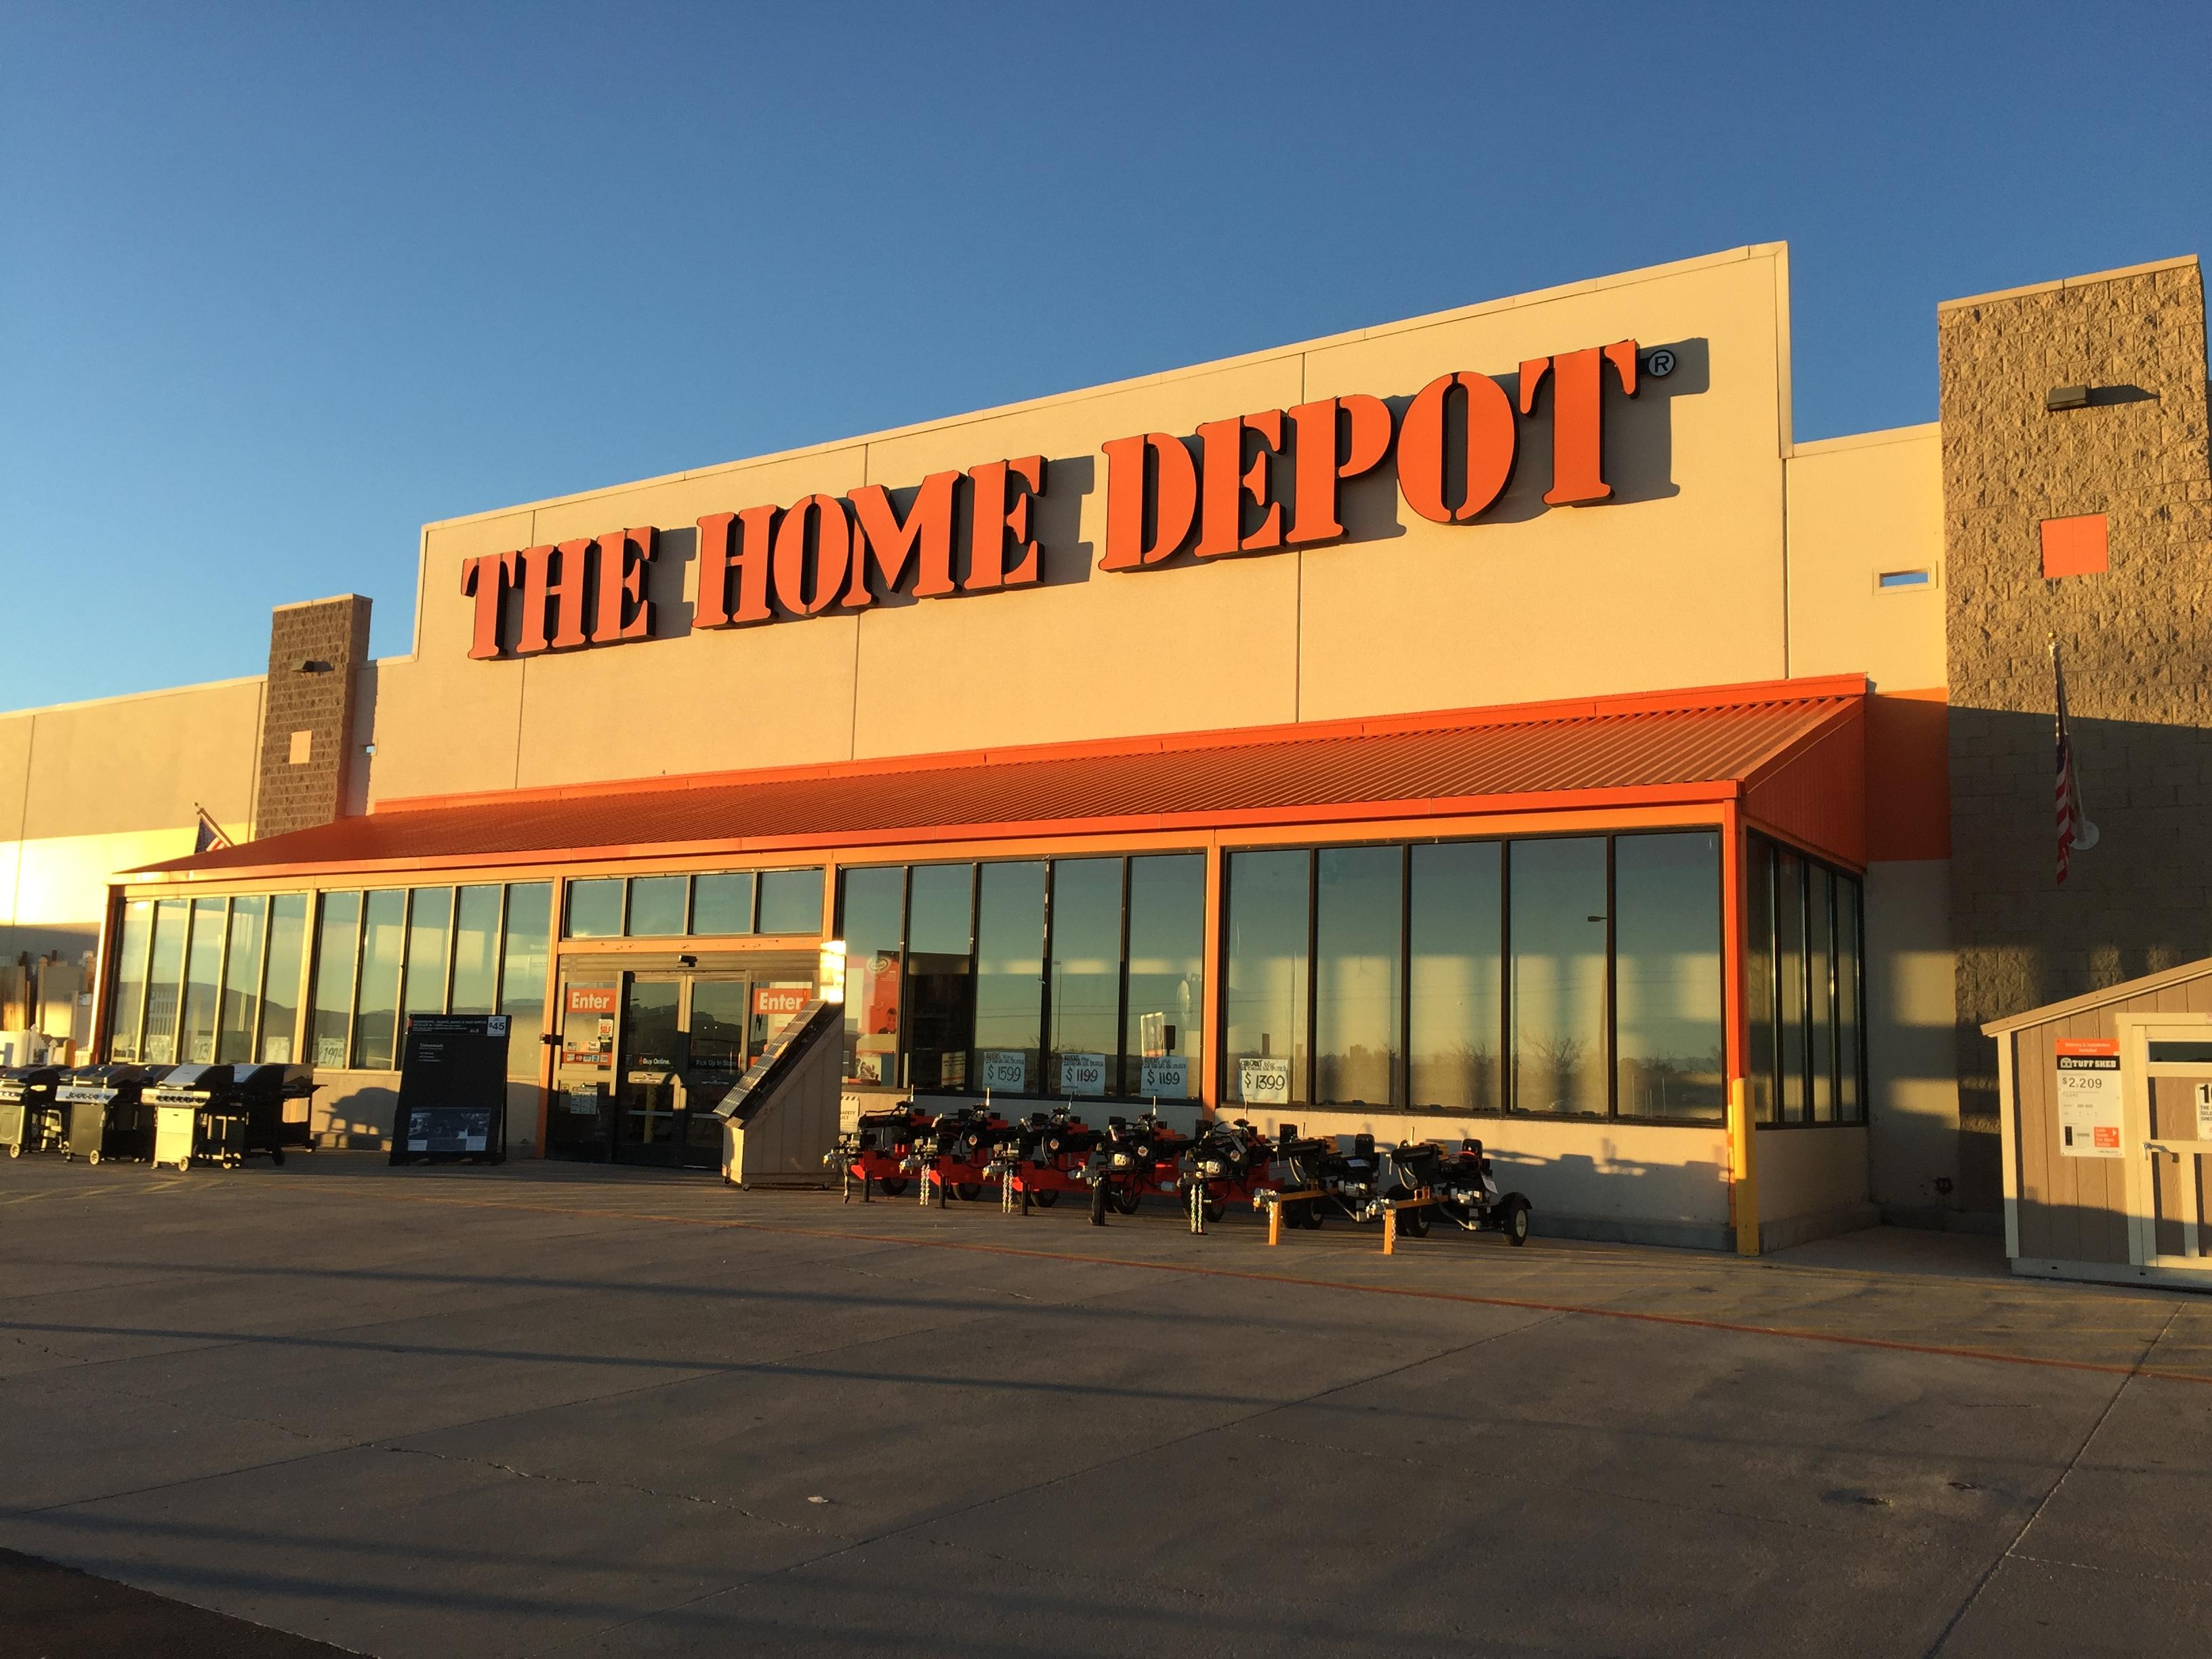 The Home Depot 7700 US 550 NE Rio Rancho, NM Home Depot - MapQuest